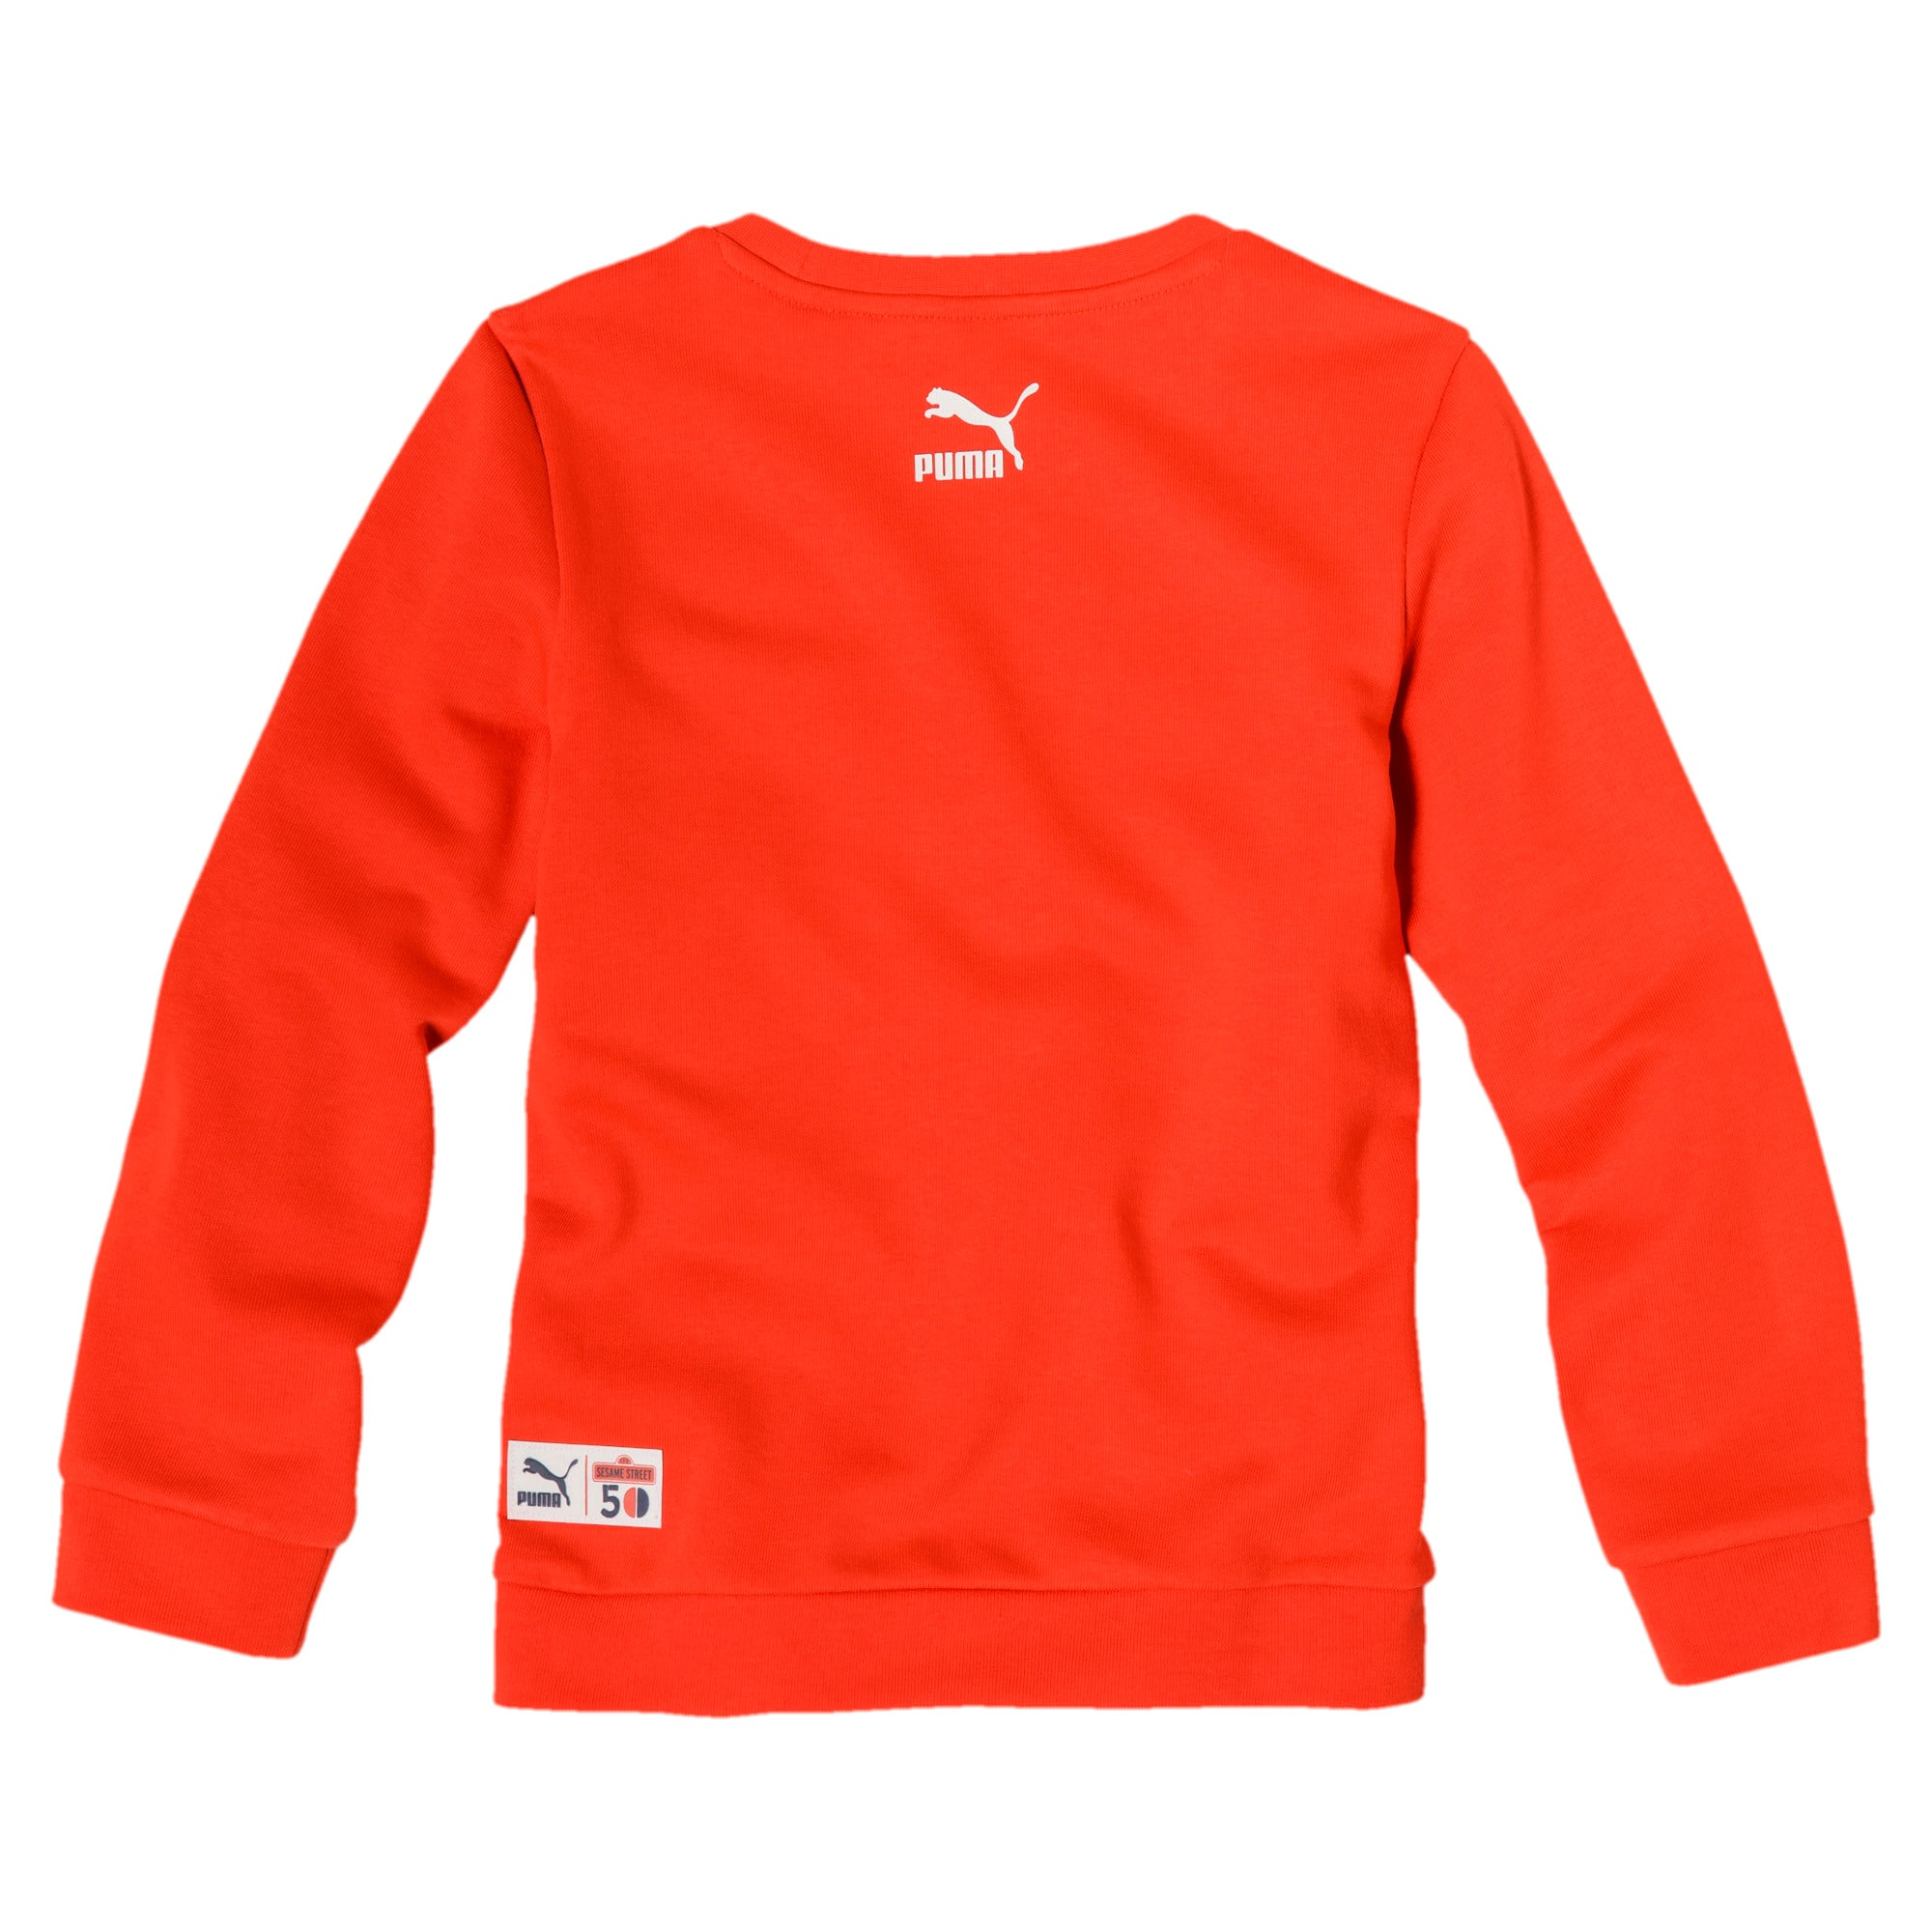 Thumbnail 2 of Sesamstraße Jungen Sweatshirt mit Rundhalsausschnitt, Cherry Tomato, medium